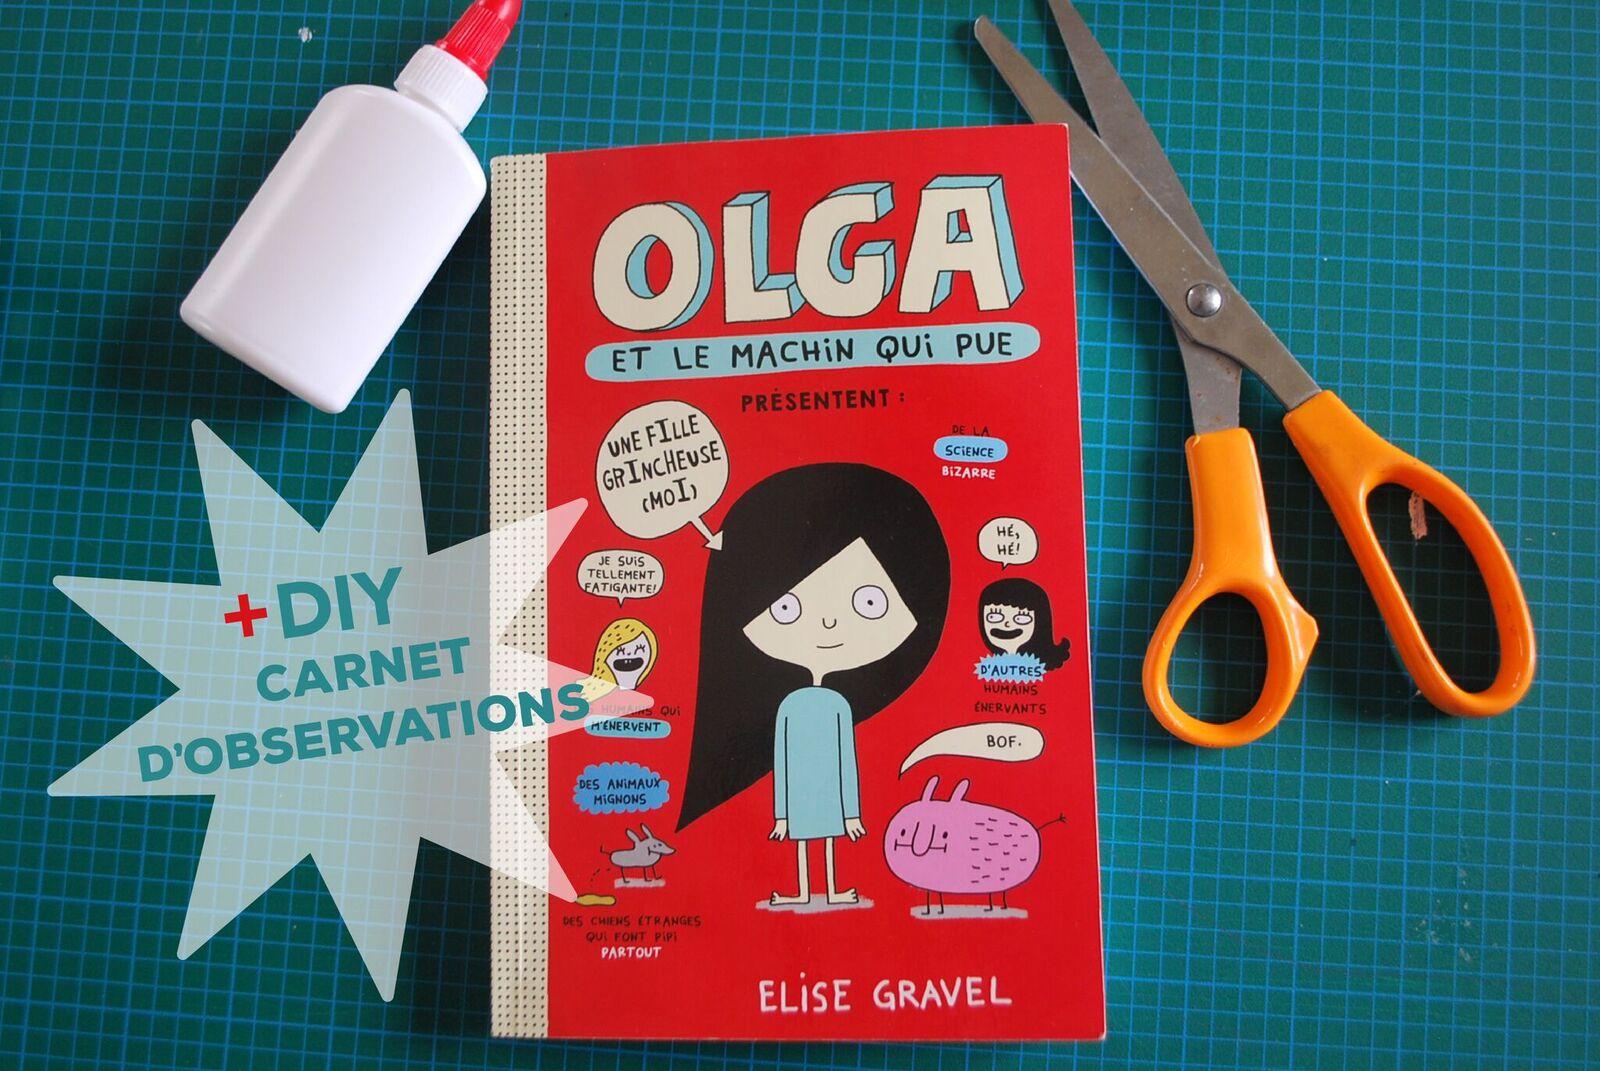 Olga et le machin qui pue + DIY carnet d'observations